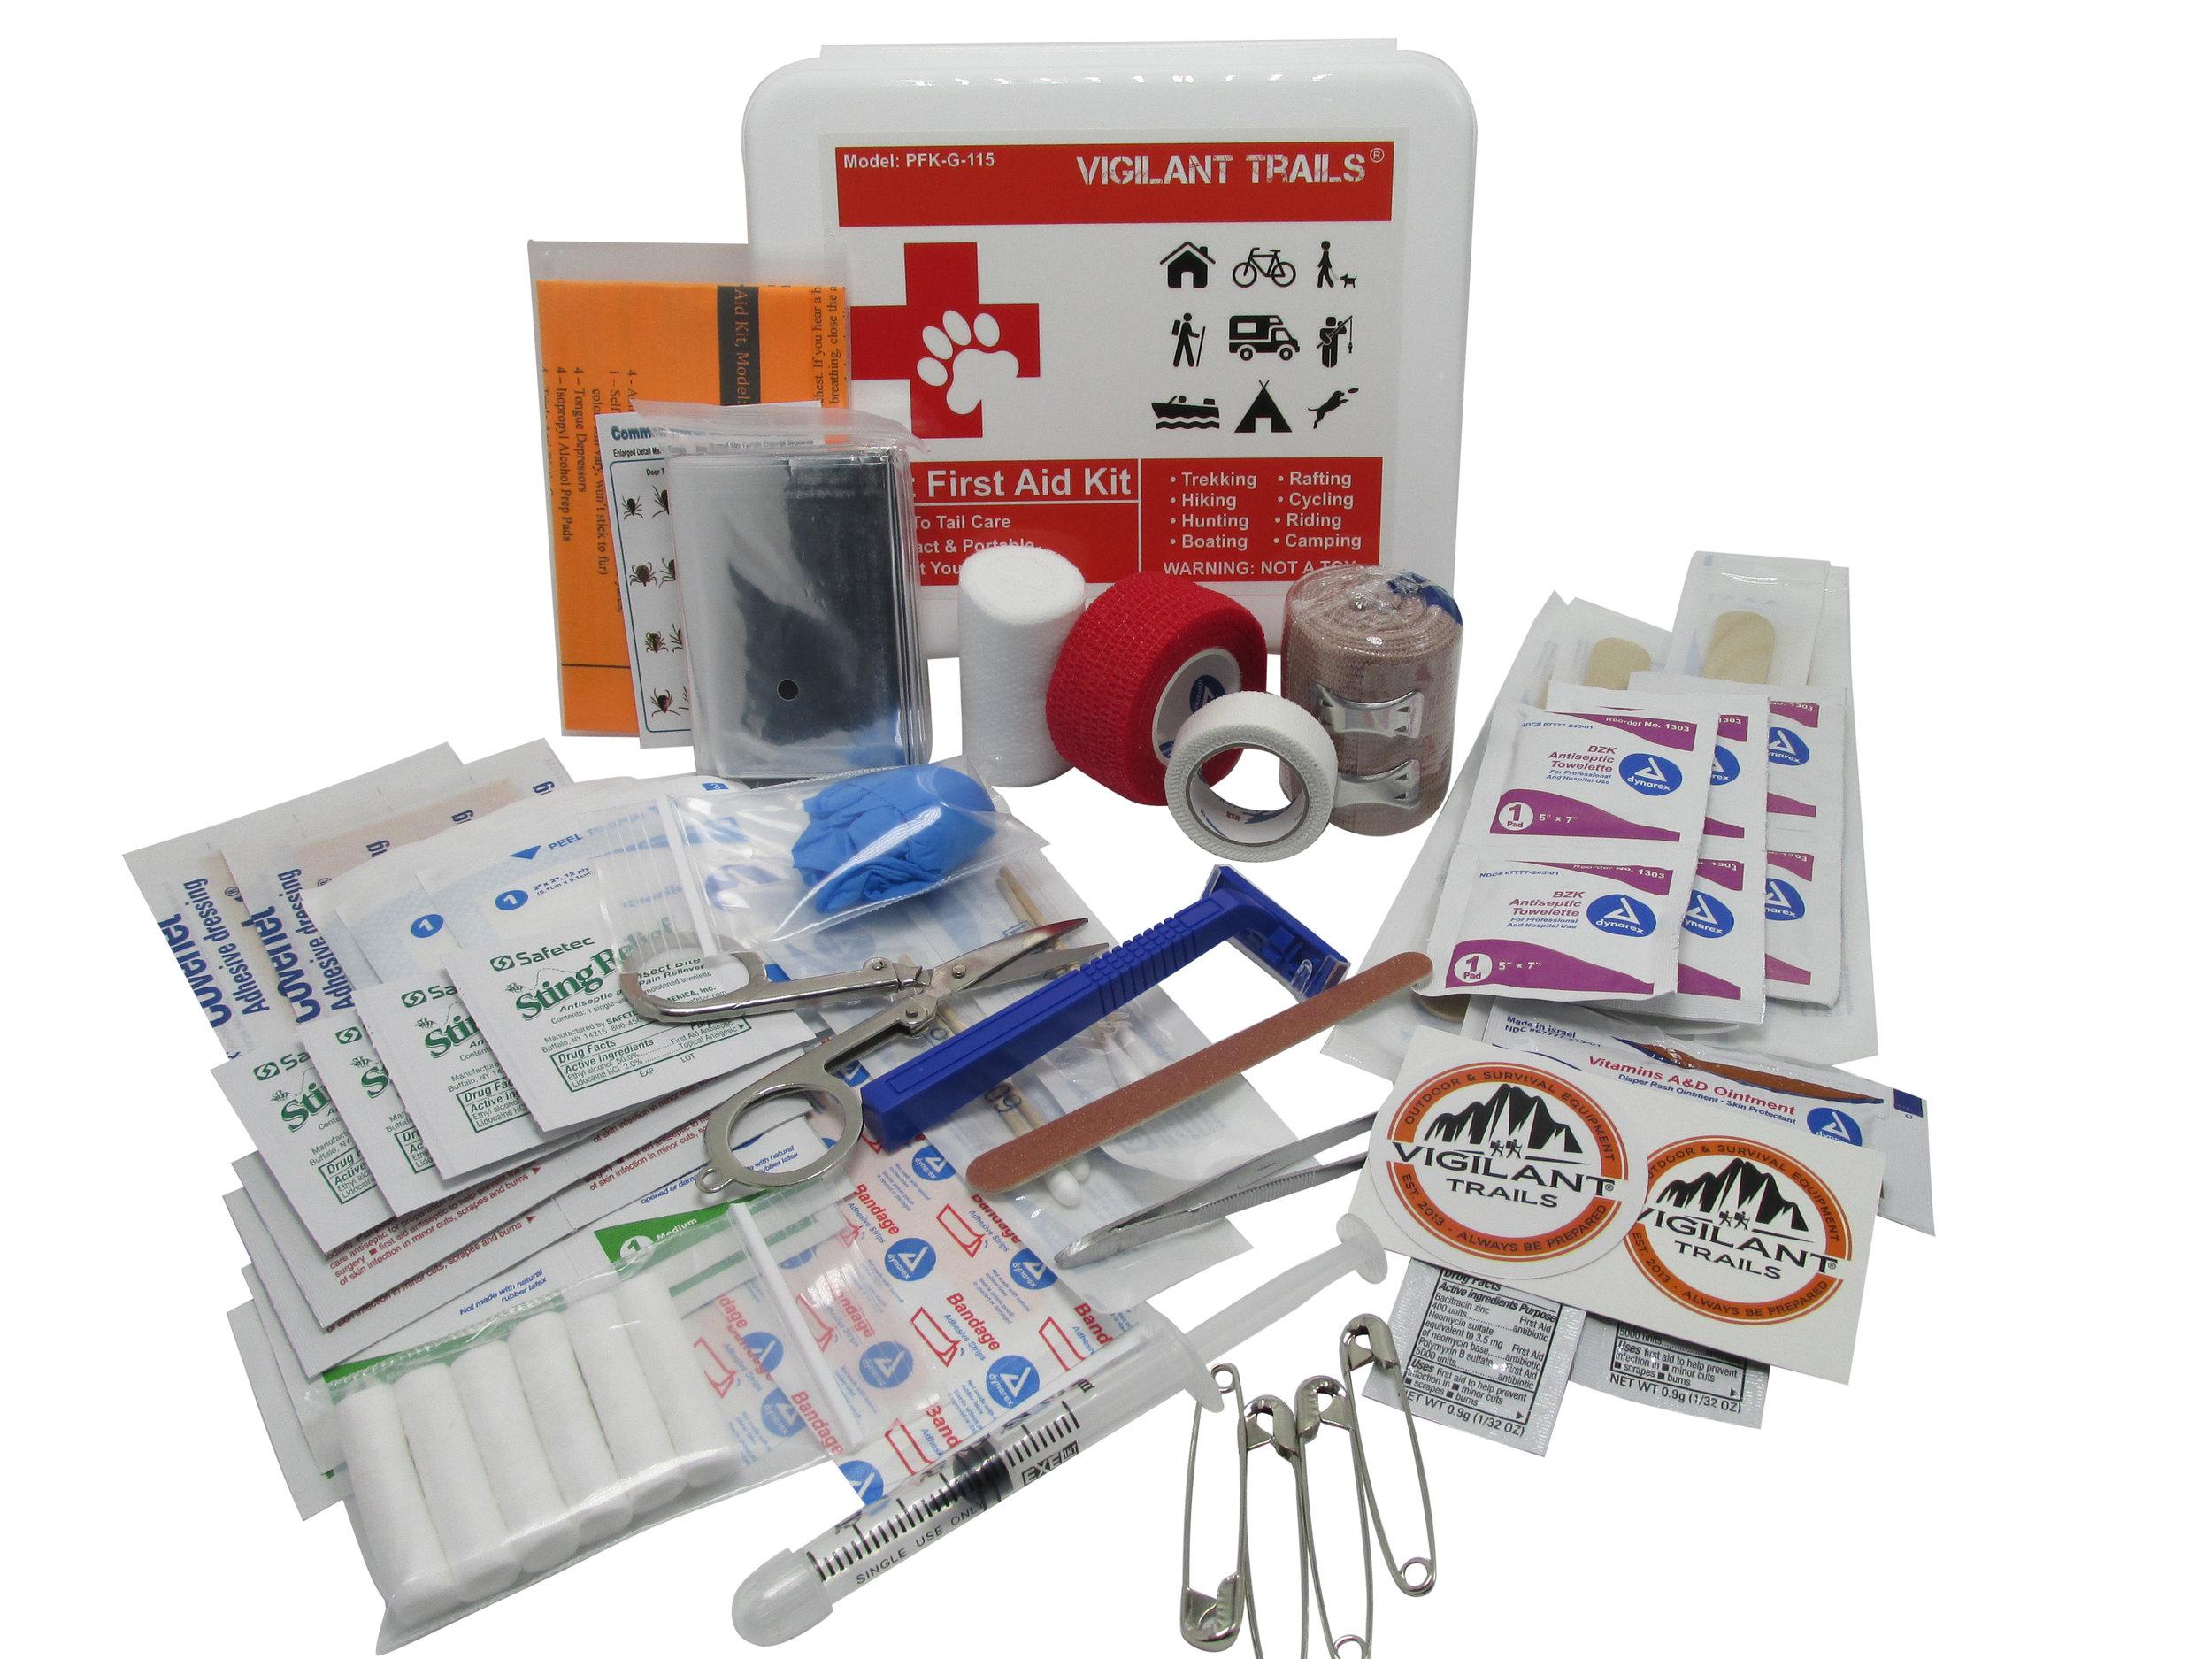 Vigilant Trails® Pet First Aid Kit To-Go | Nose to Tail Care — Vigilant  Trails